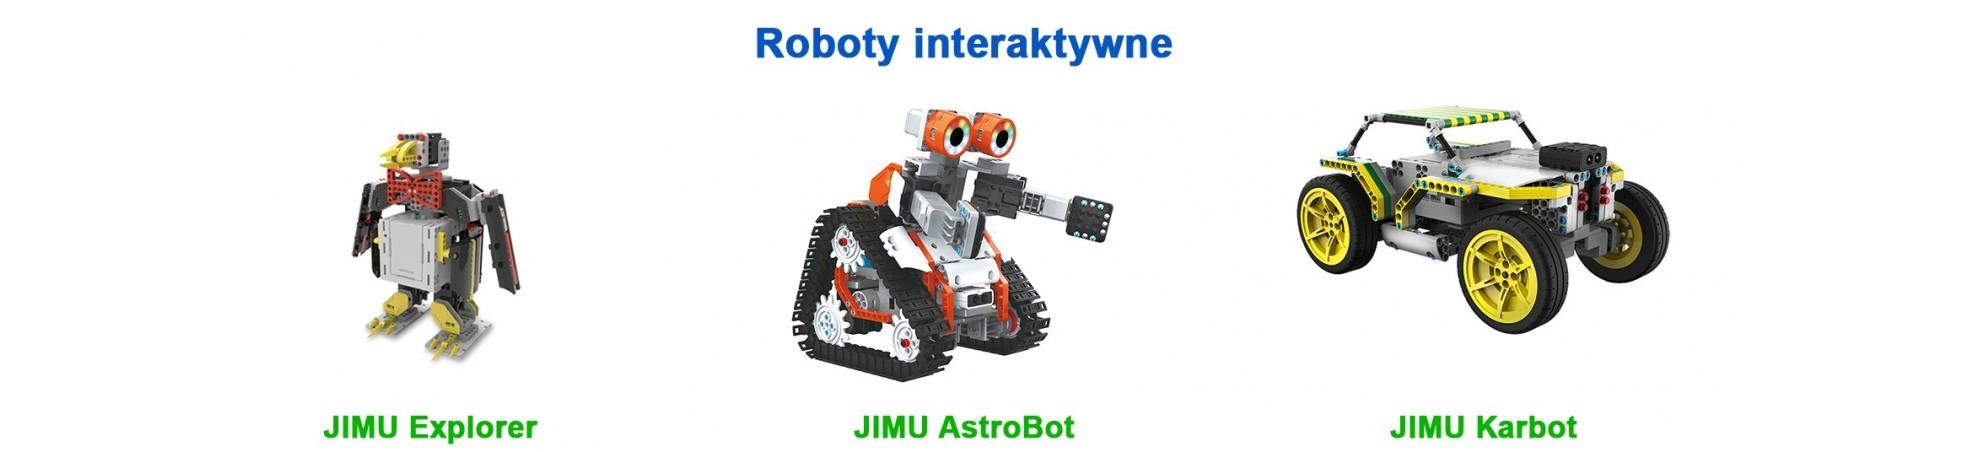 Roboty interaktywne